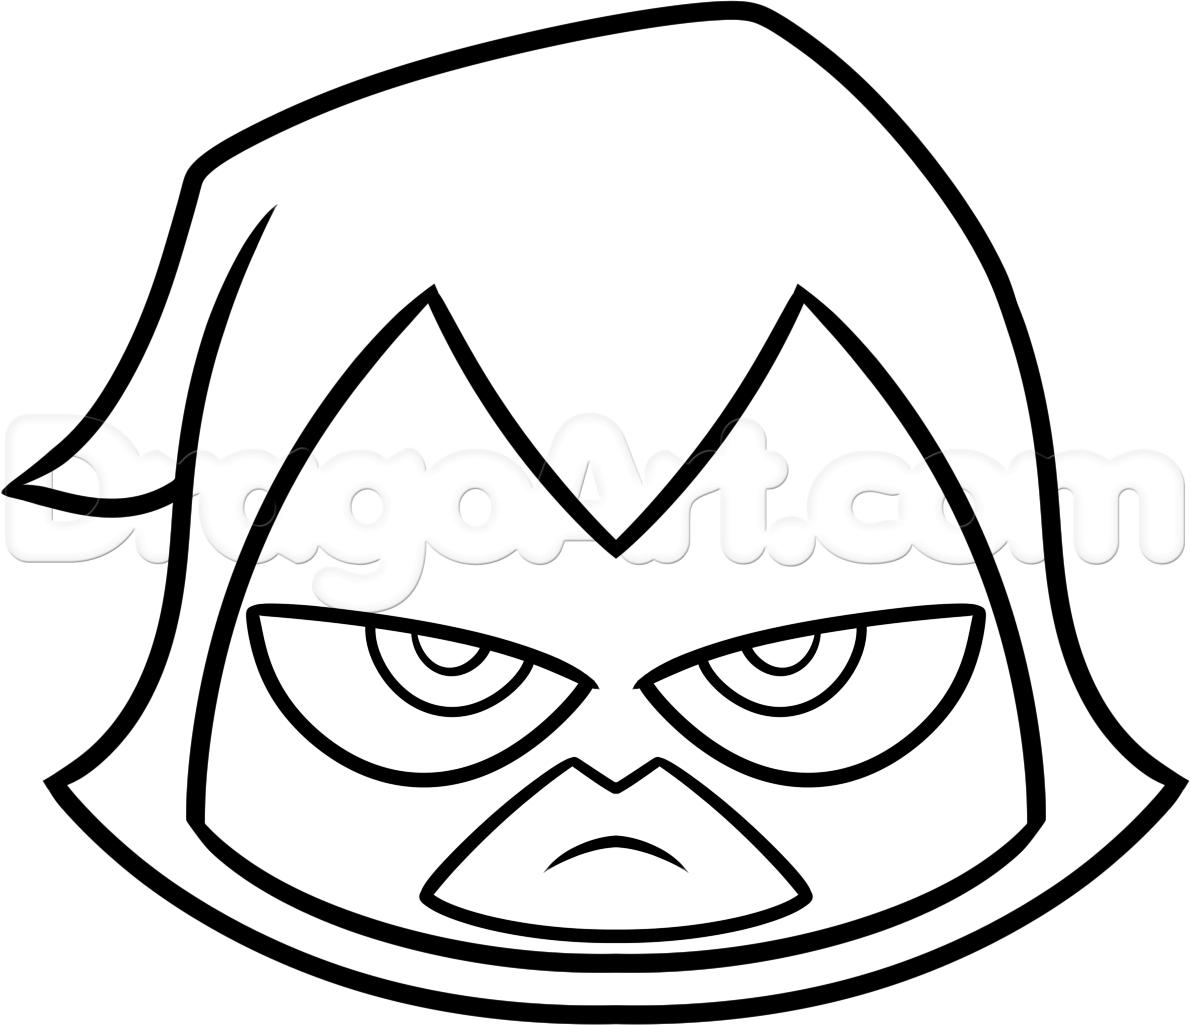 1190x1025 Cartoon Network Drawings Cartoon Network Drawing